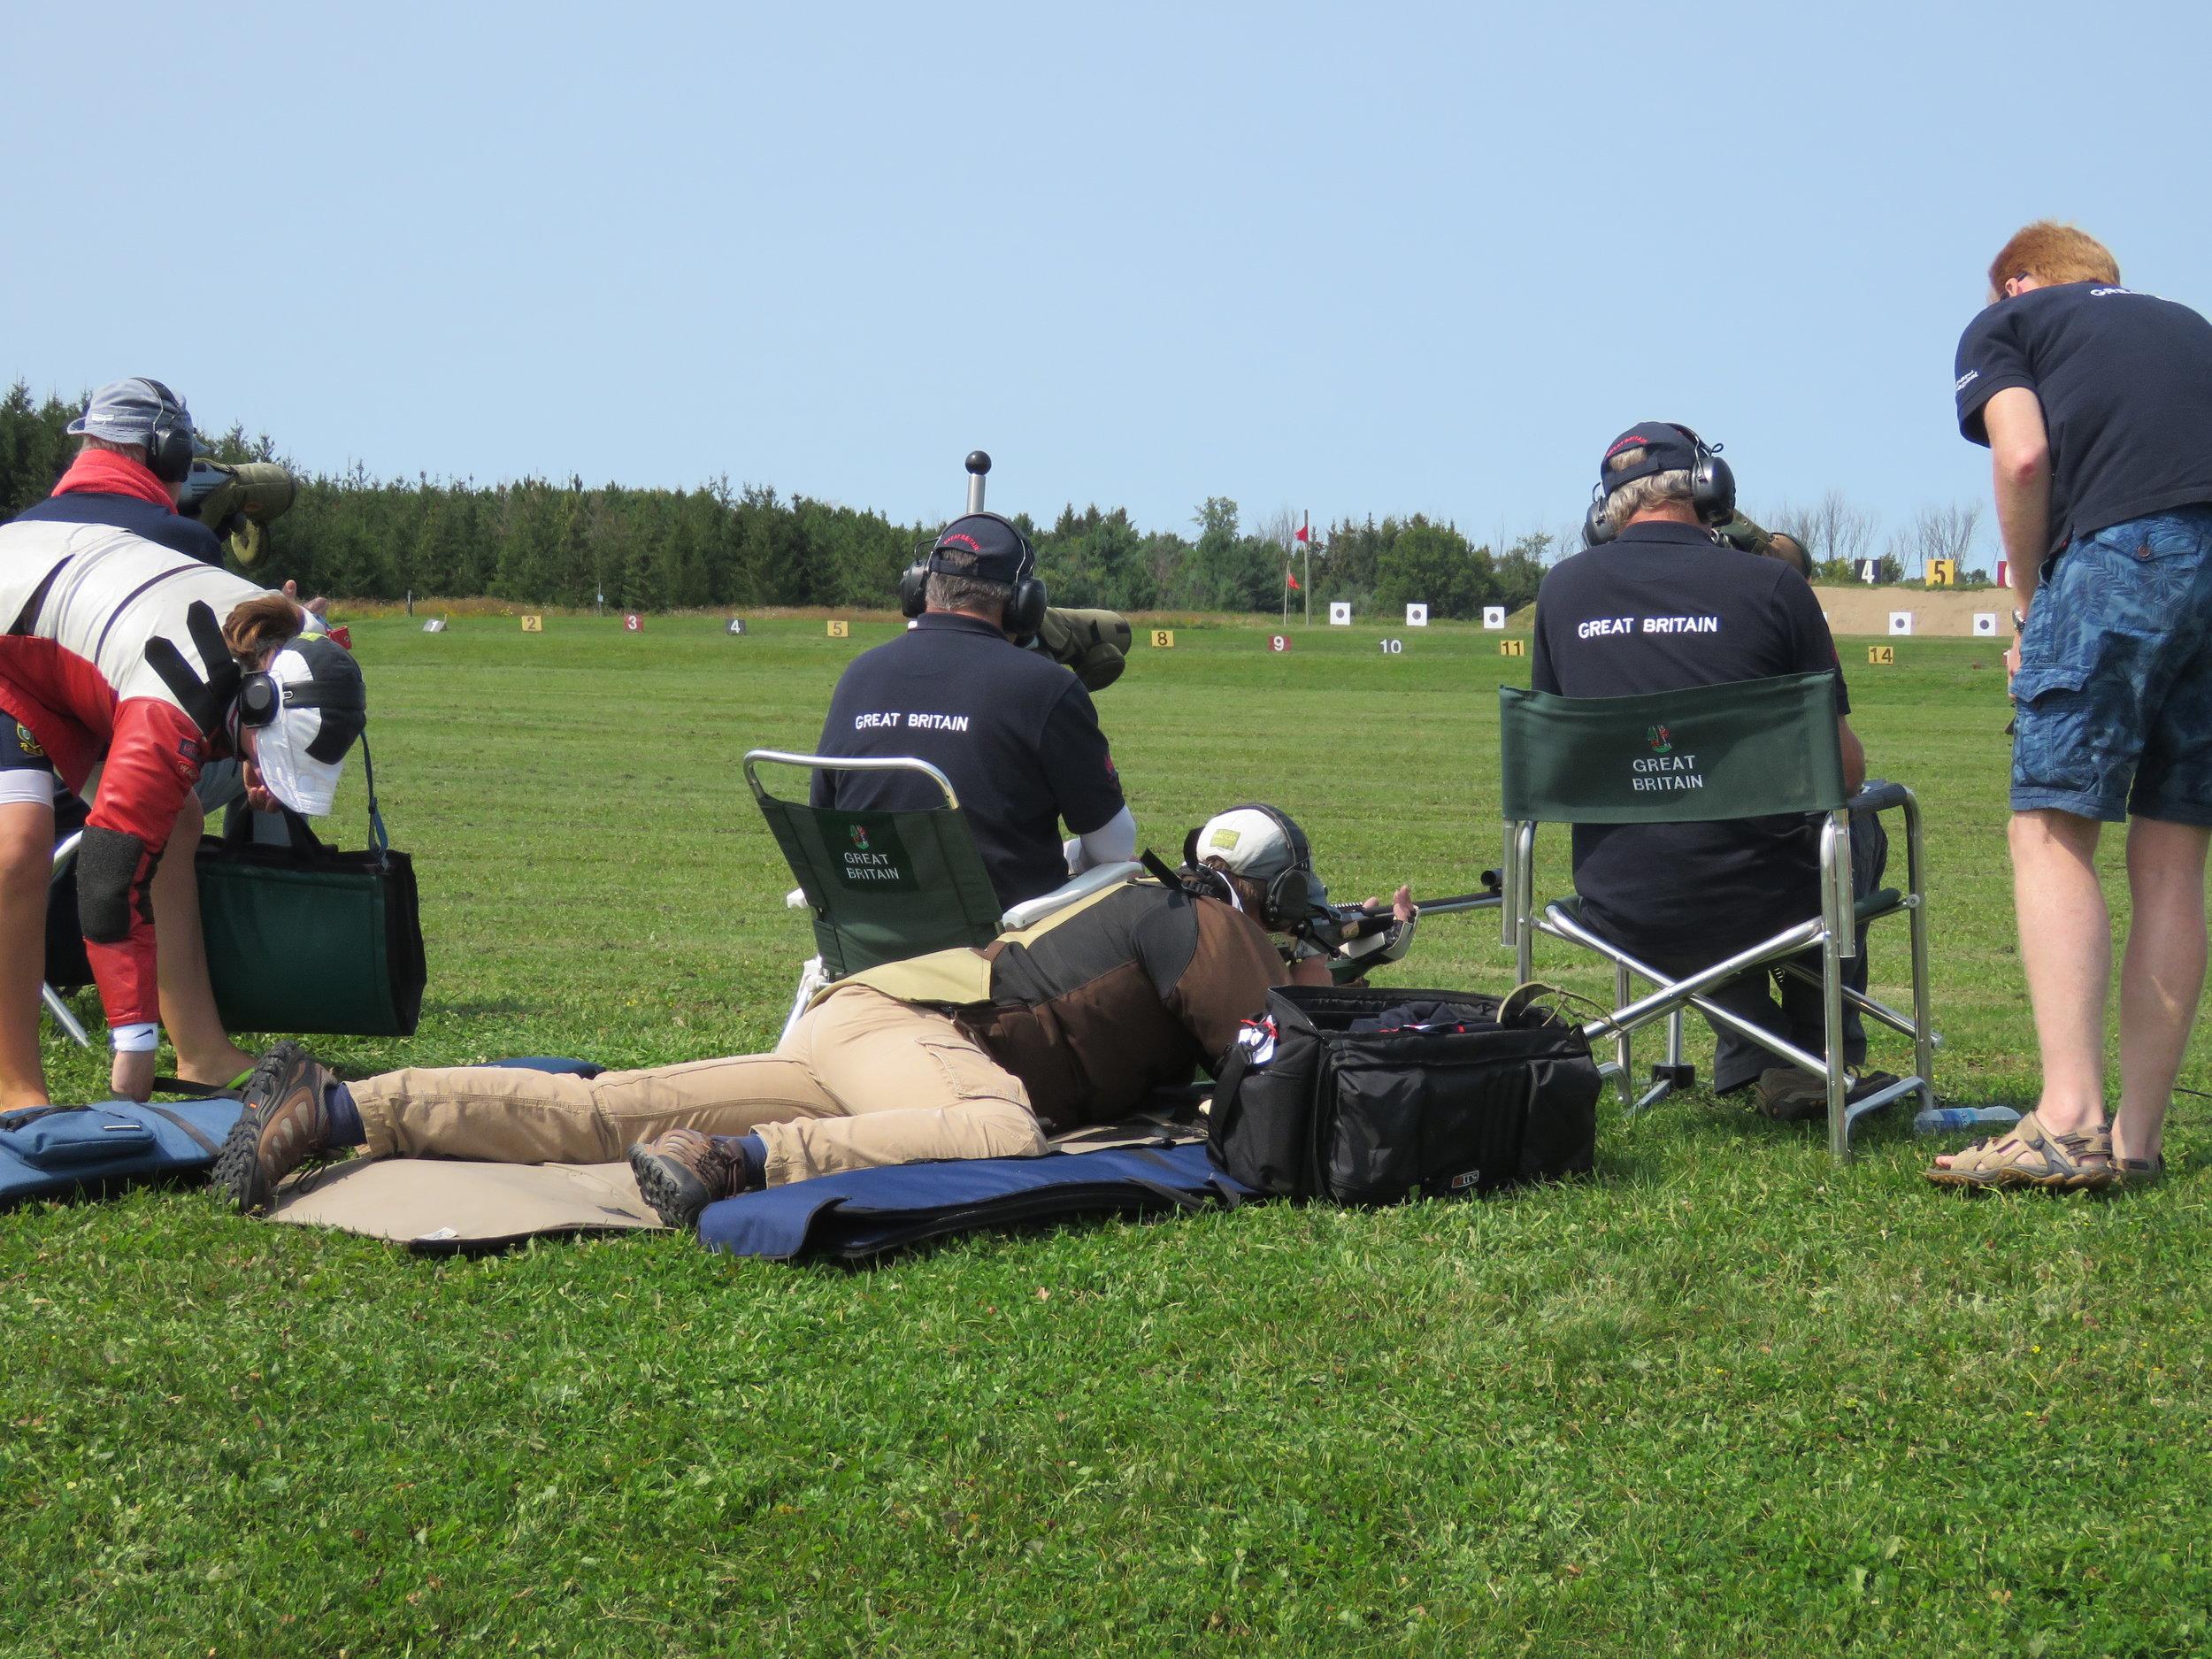 IMG_5651 Angus GB Team Canada Match.JPG